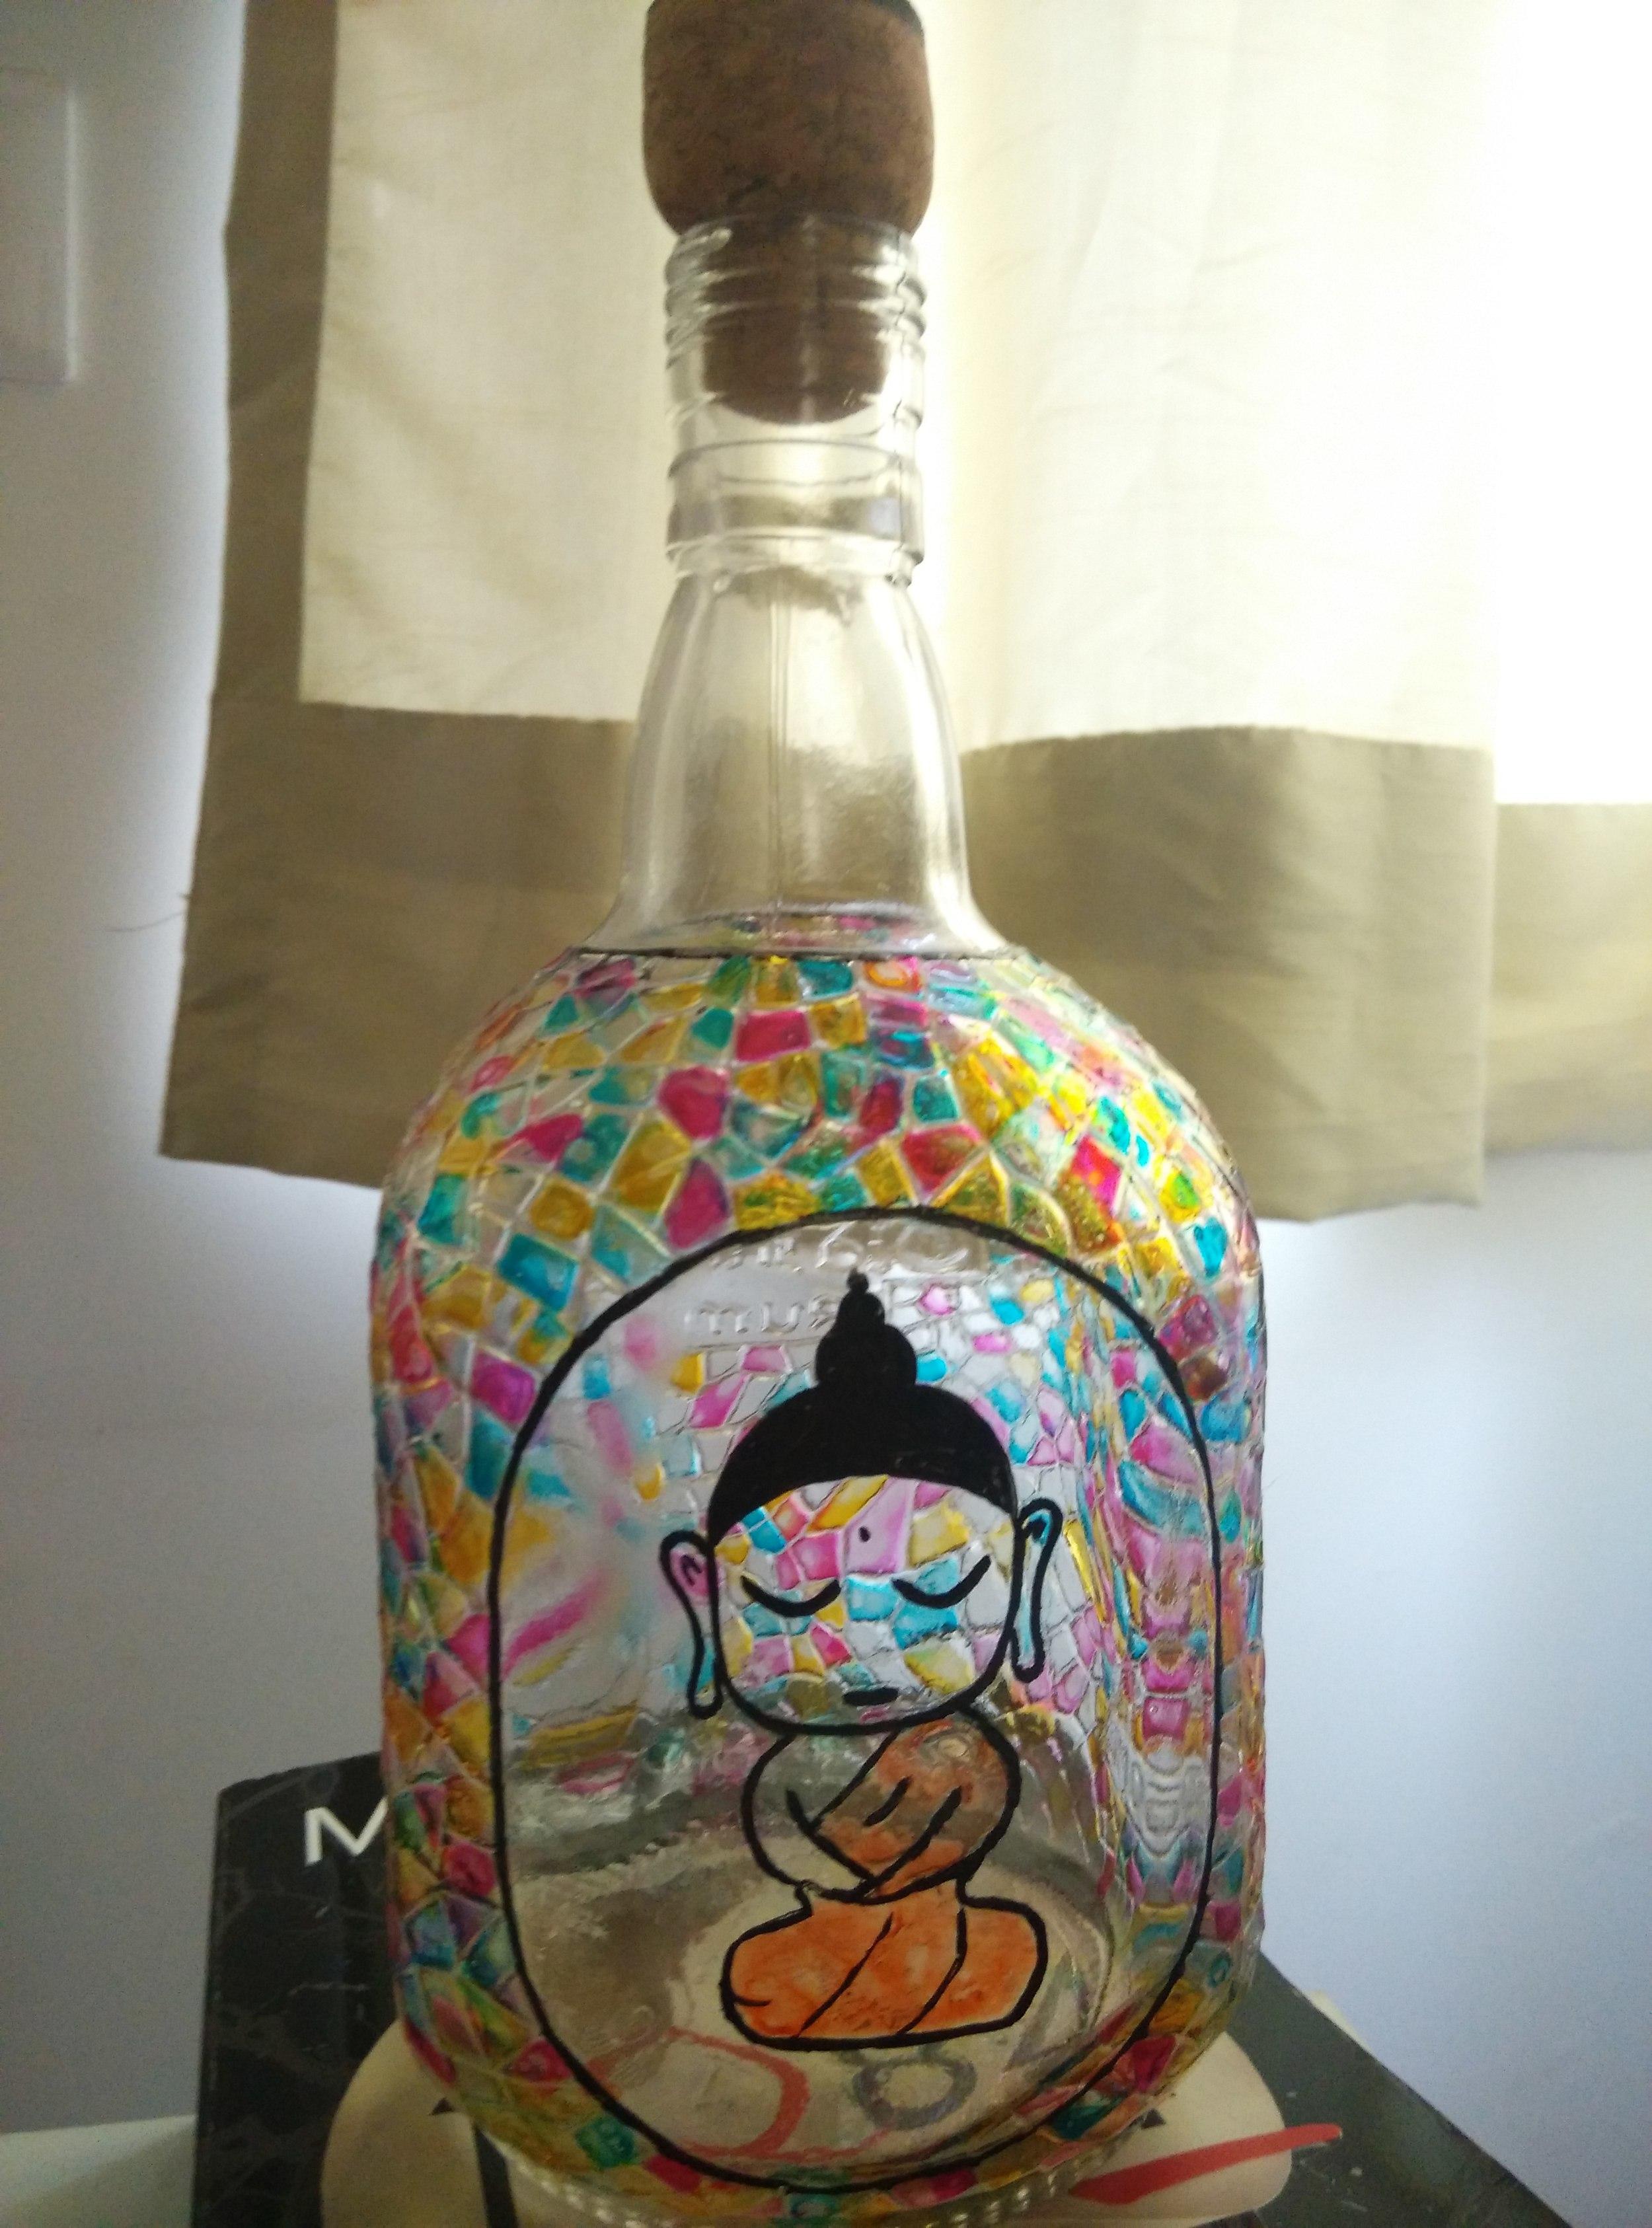 Little Buddha on an Old Monk bottle -Not my work